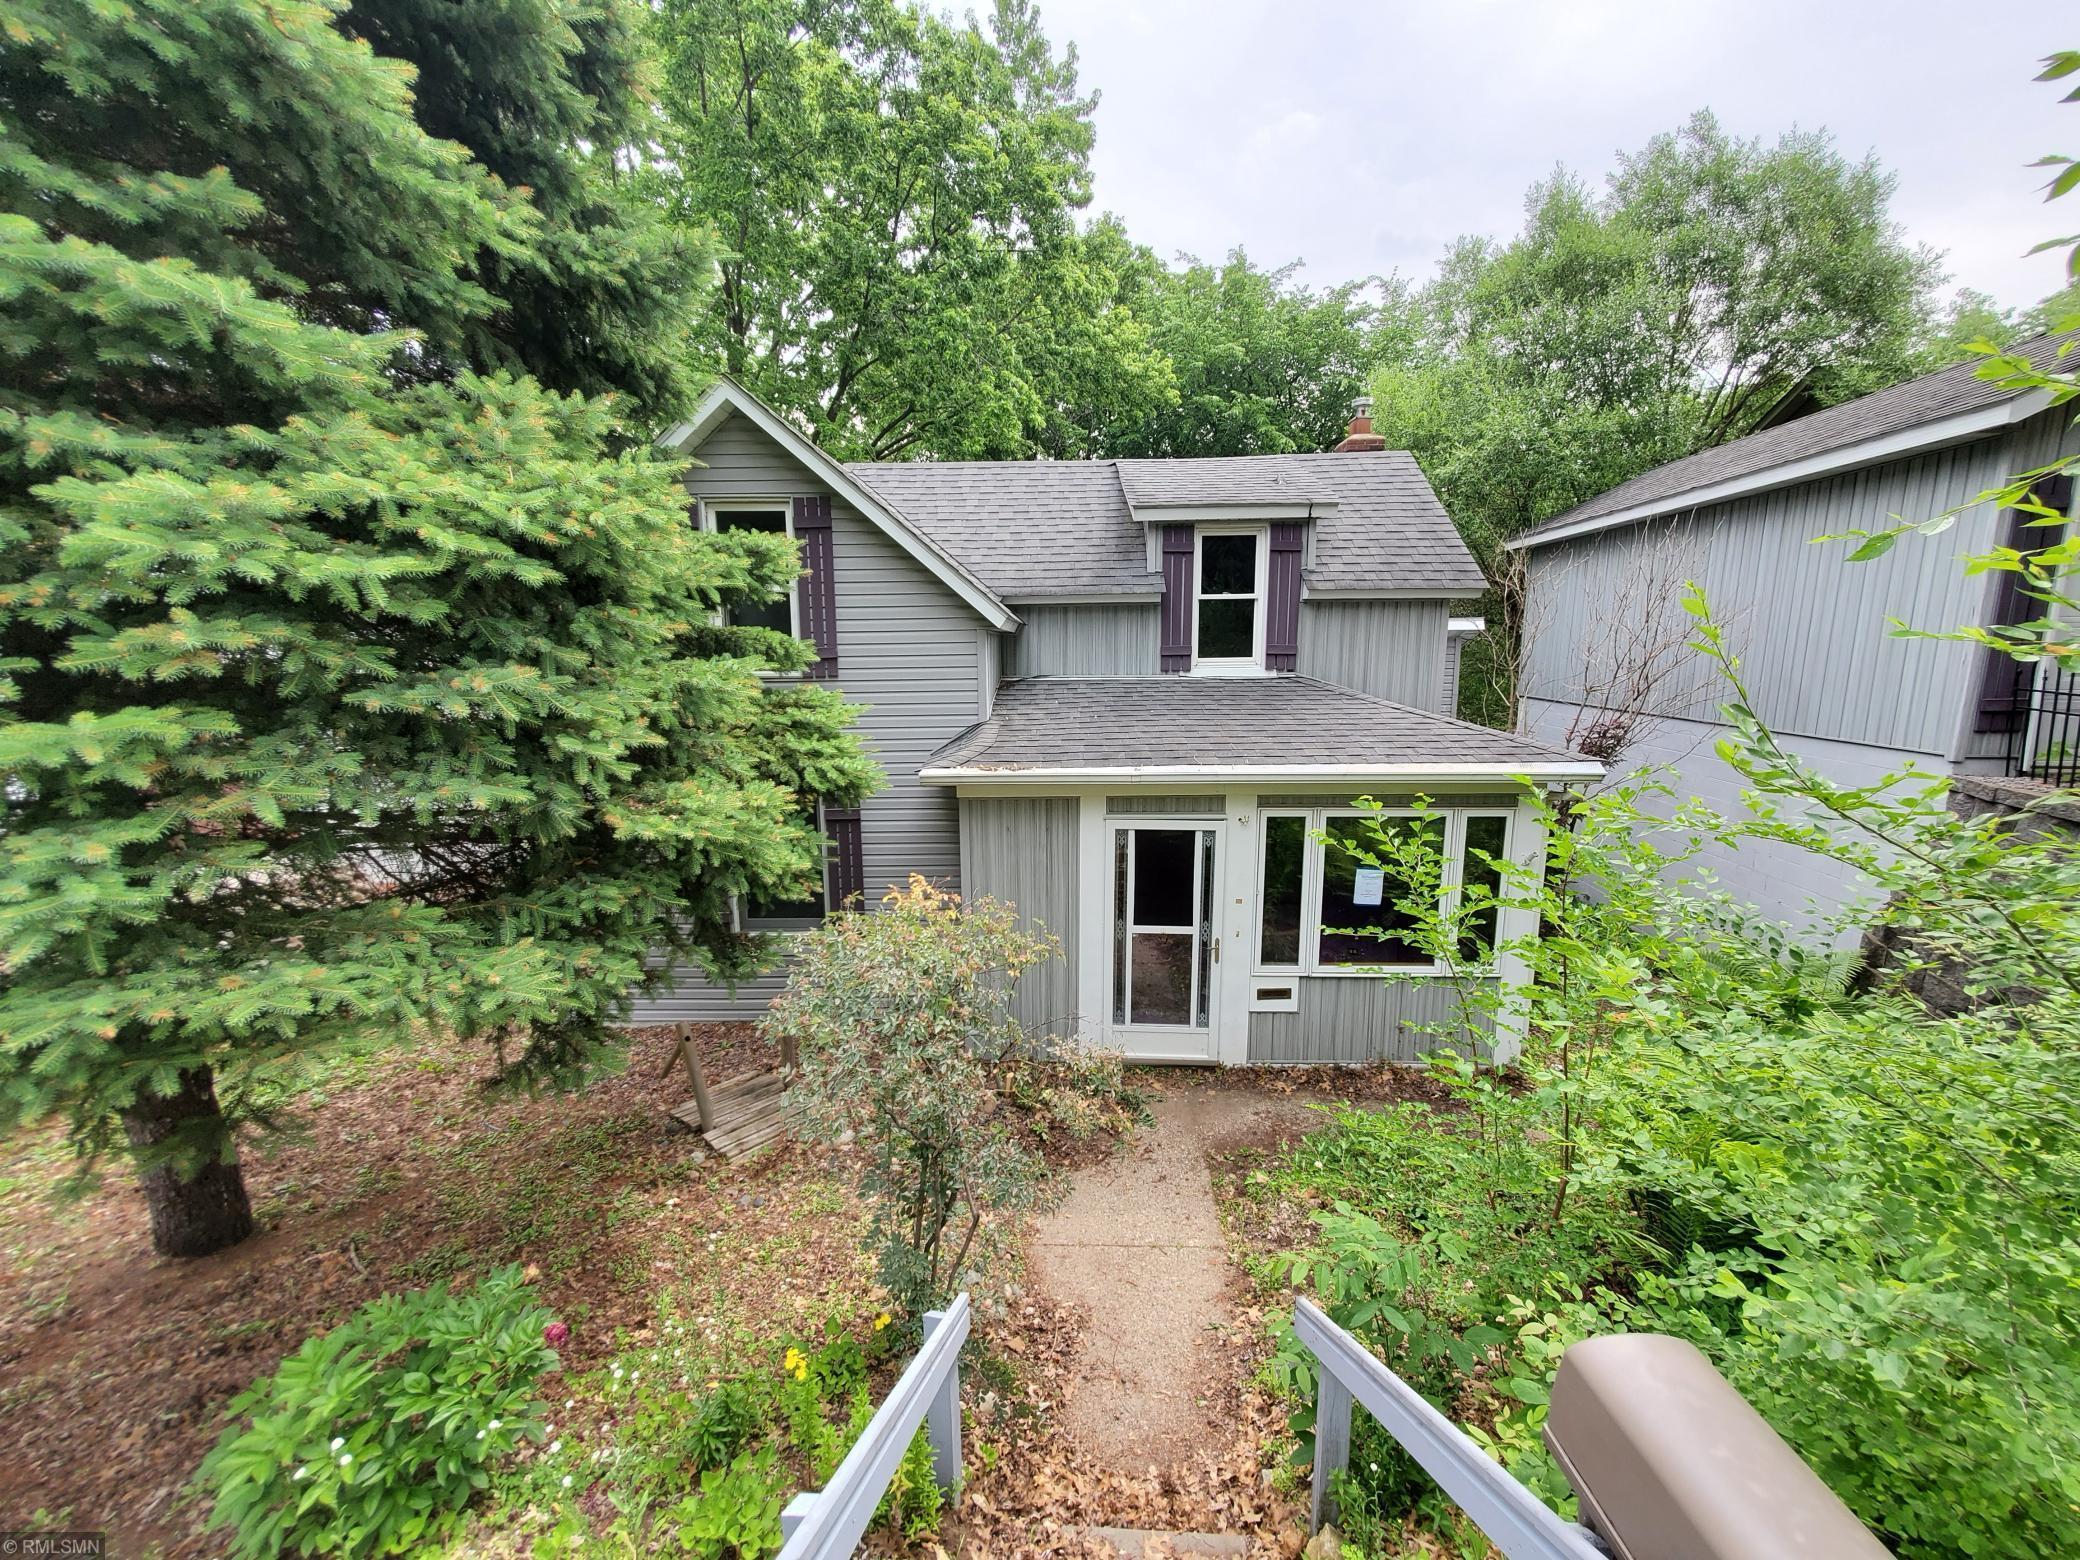 725 6th N Property Photo - Bayport, MN real estate listing